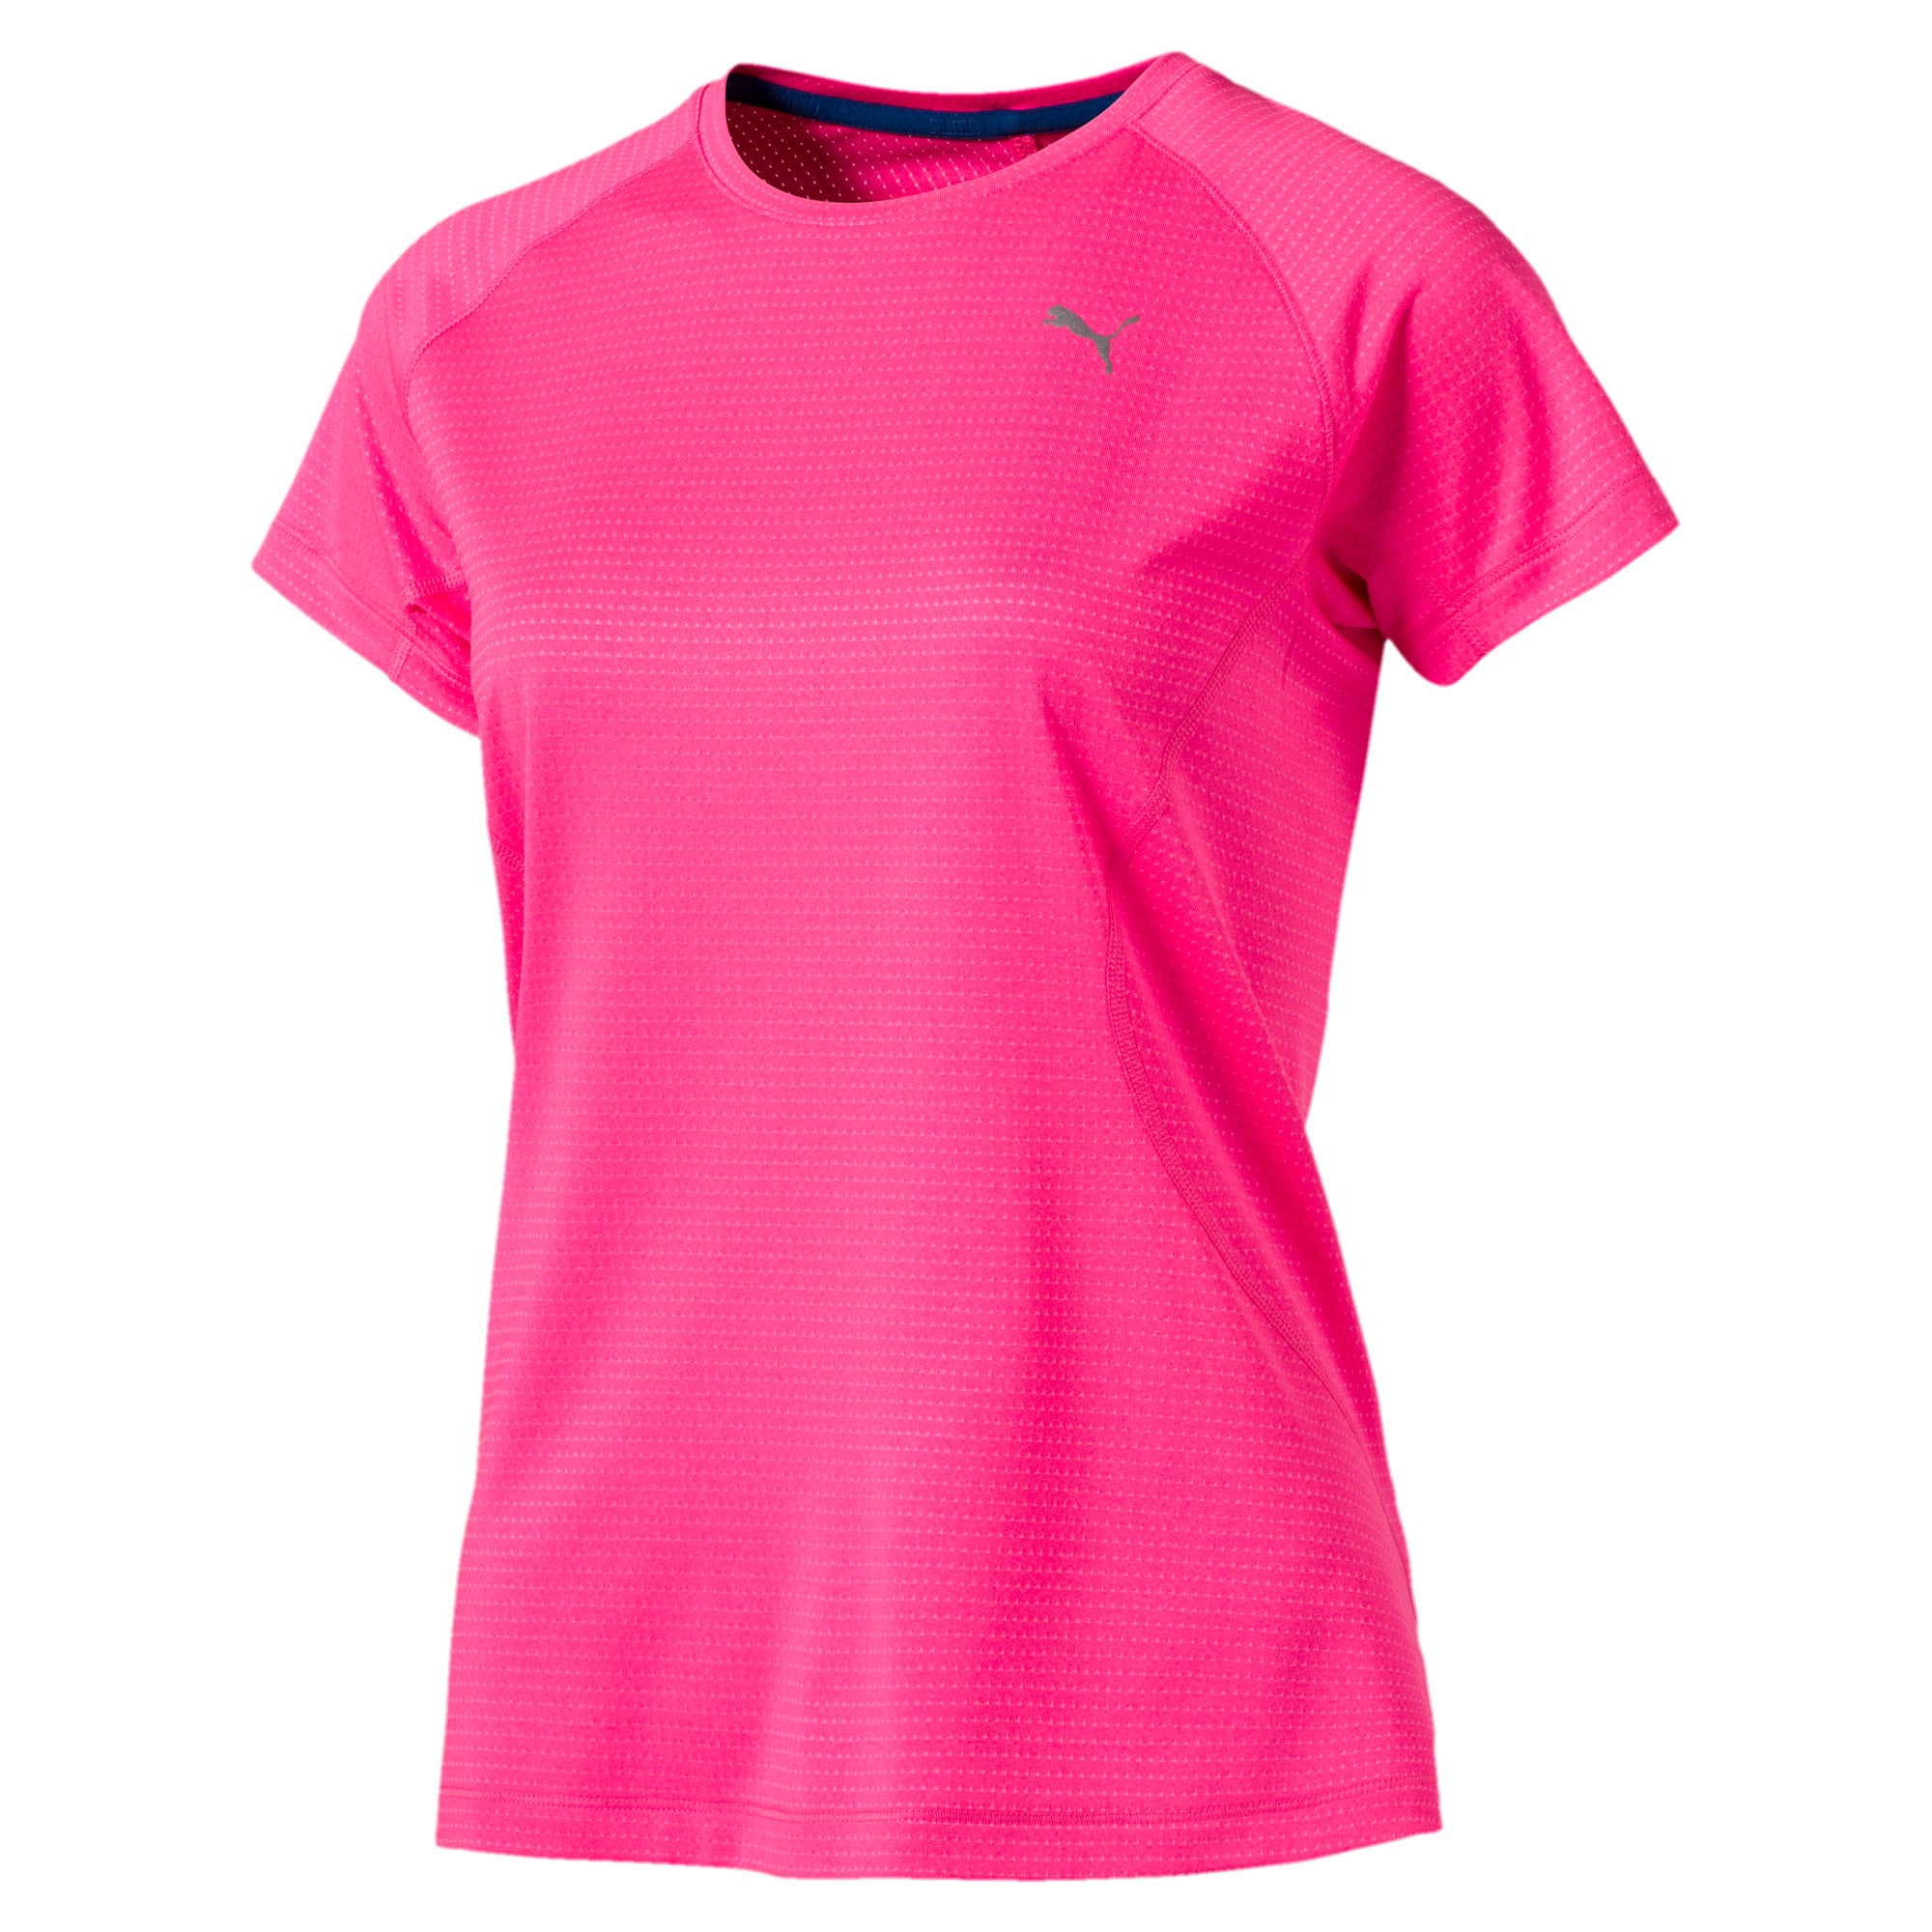 Thumbnail 1 of Women's Running Speed Short Sleeves Tee, KNOCKOUT PINK Heather, medium-IND